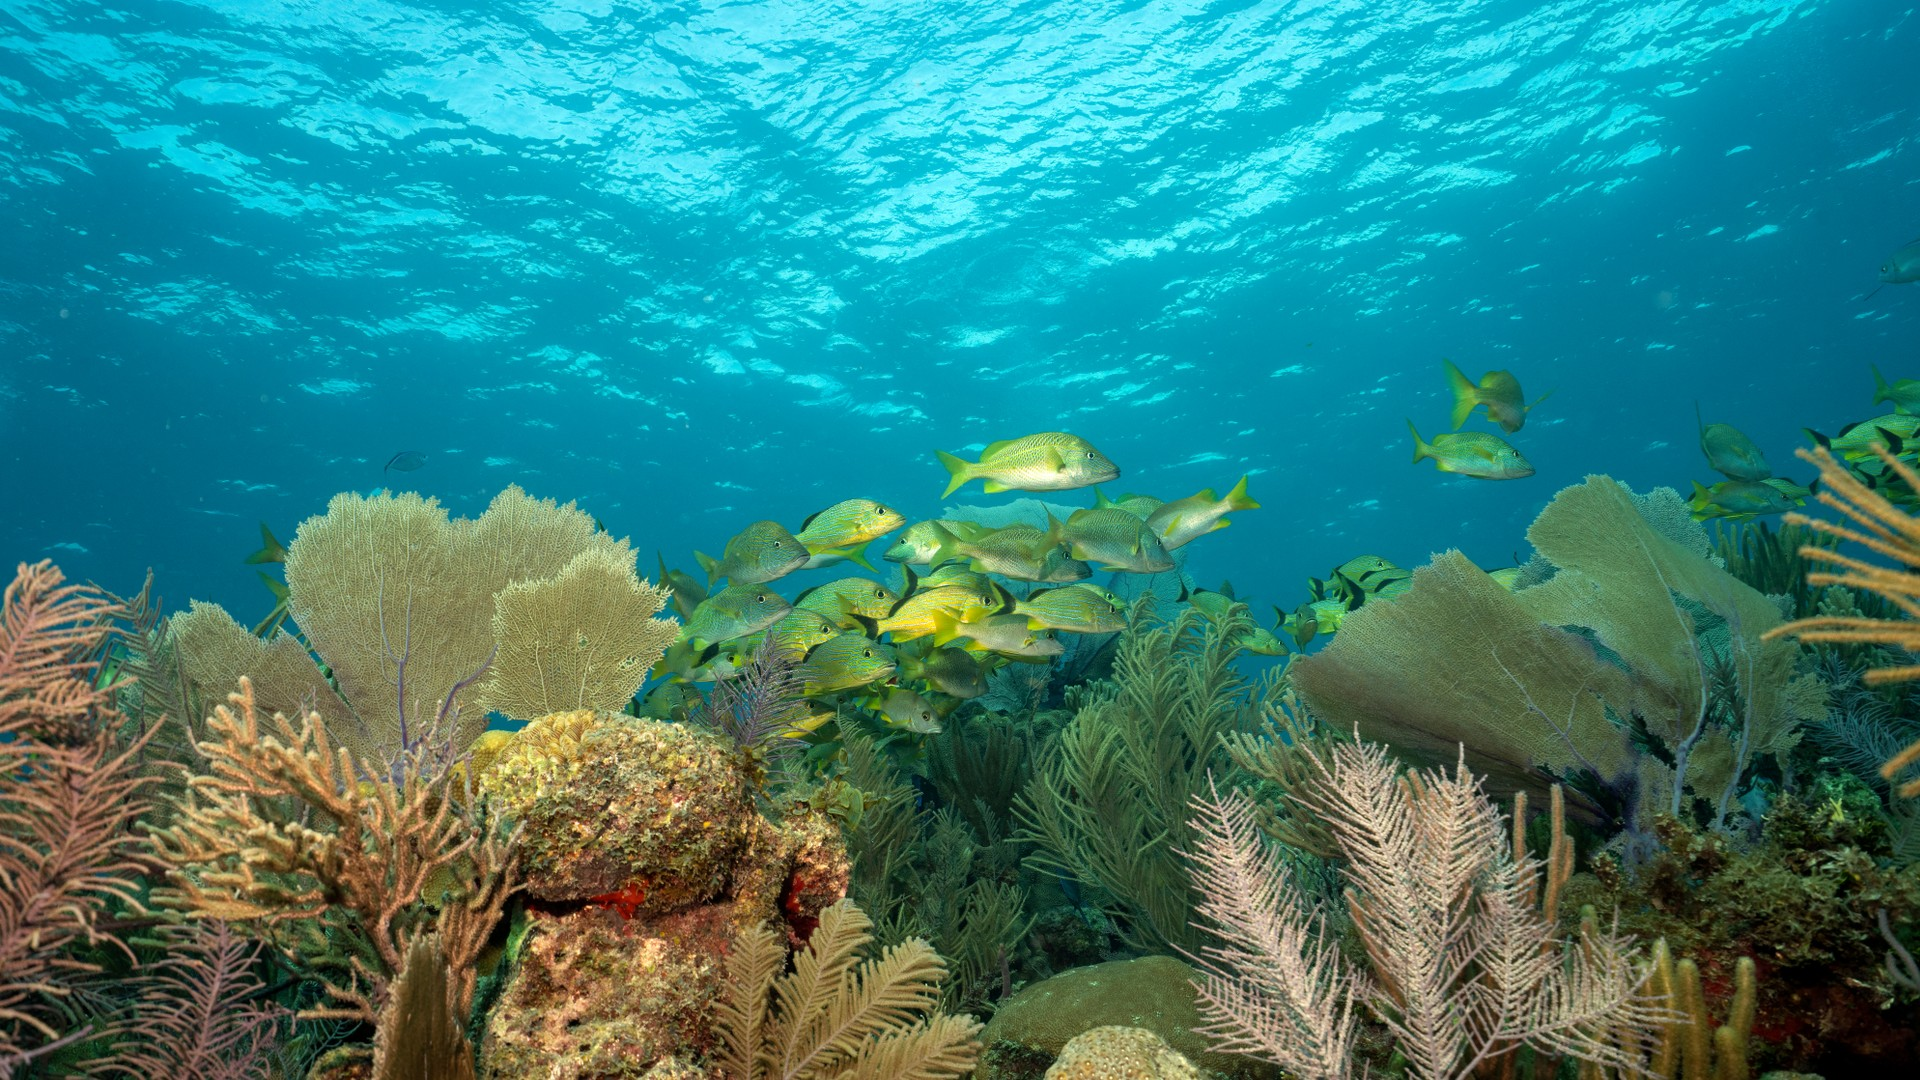 Fish and a coral reef in Jardins de la Reina, Cuba